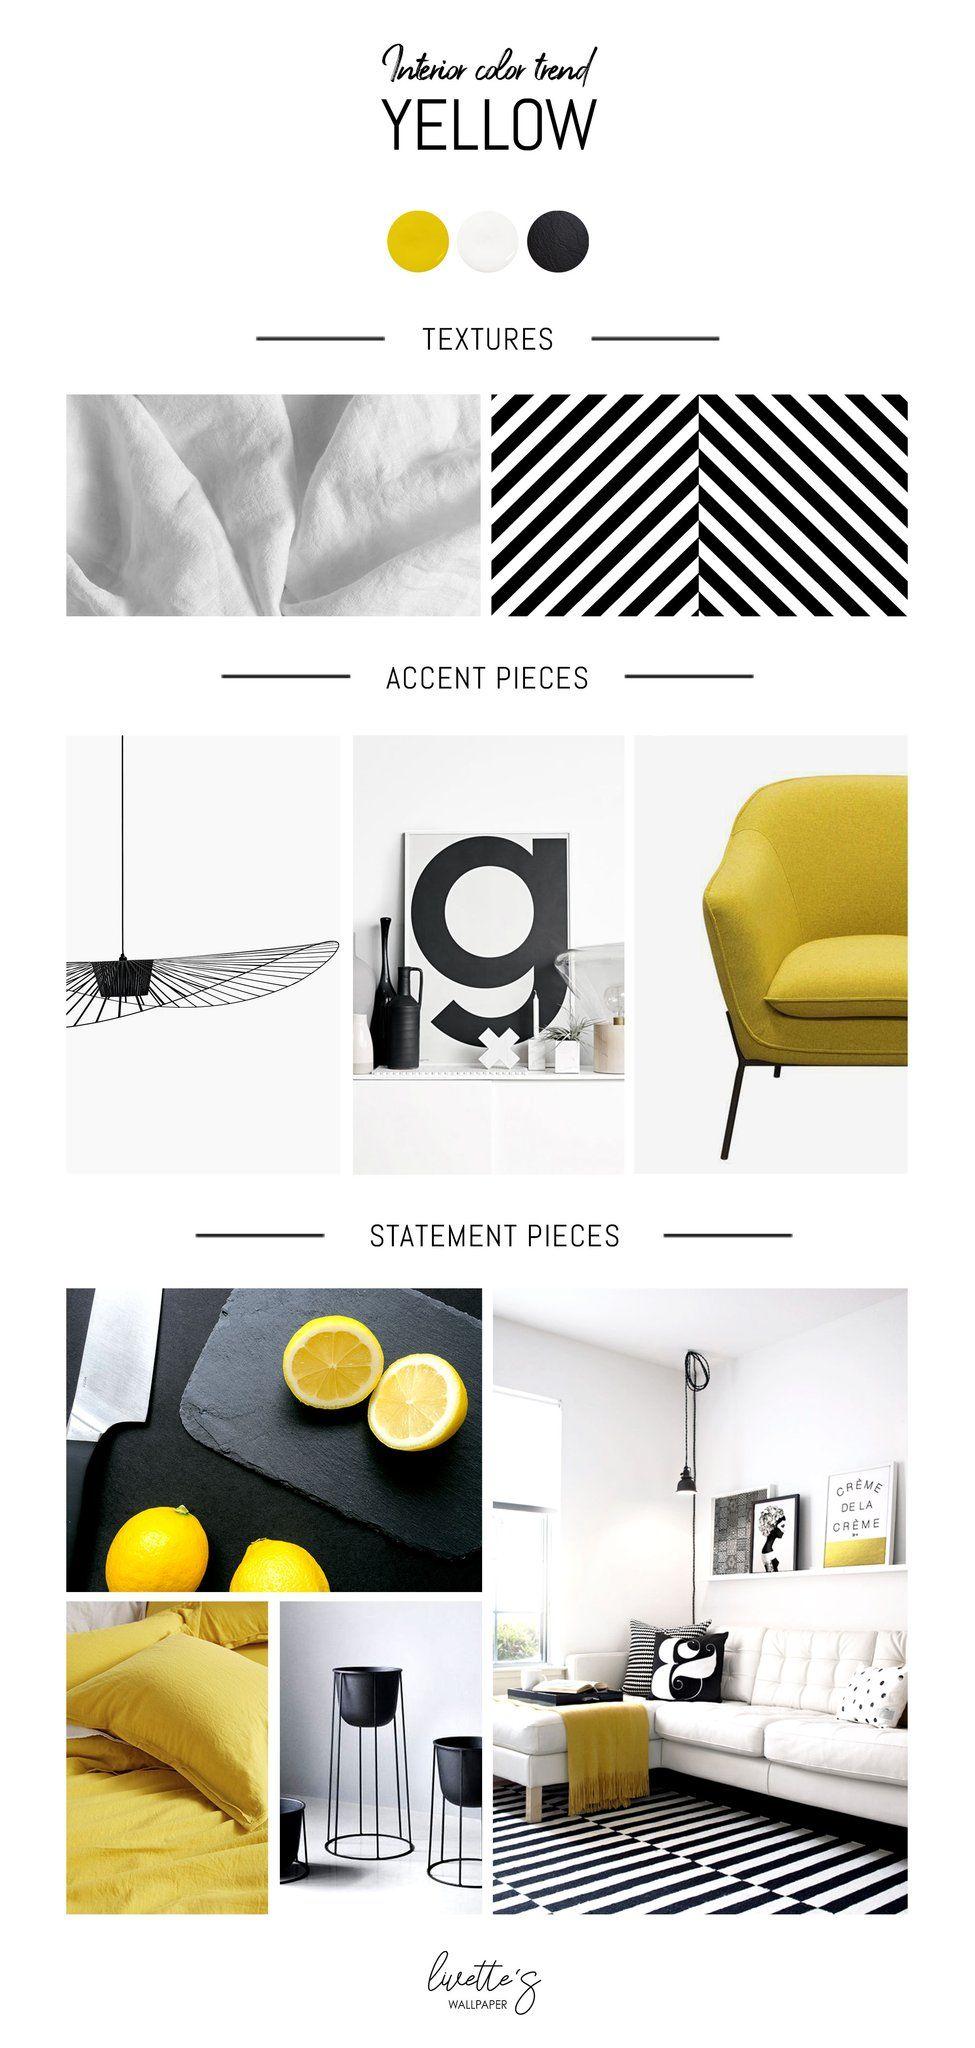 Interior Color Trend Yellow Mood Board Monday Interior Design Mood Board Interior Design Presentation Boards Interior Design Presentation